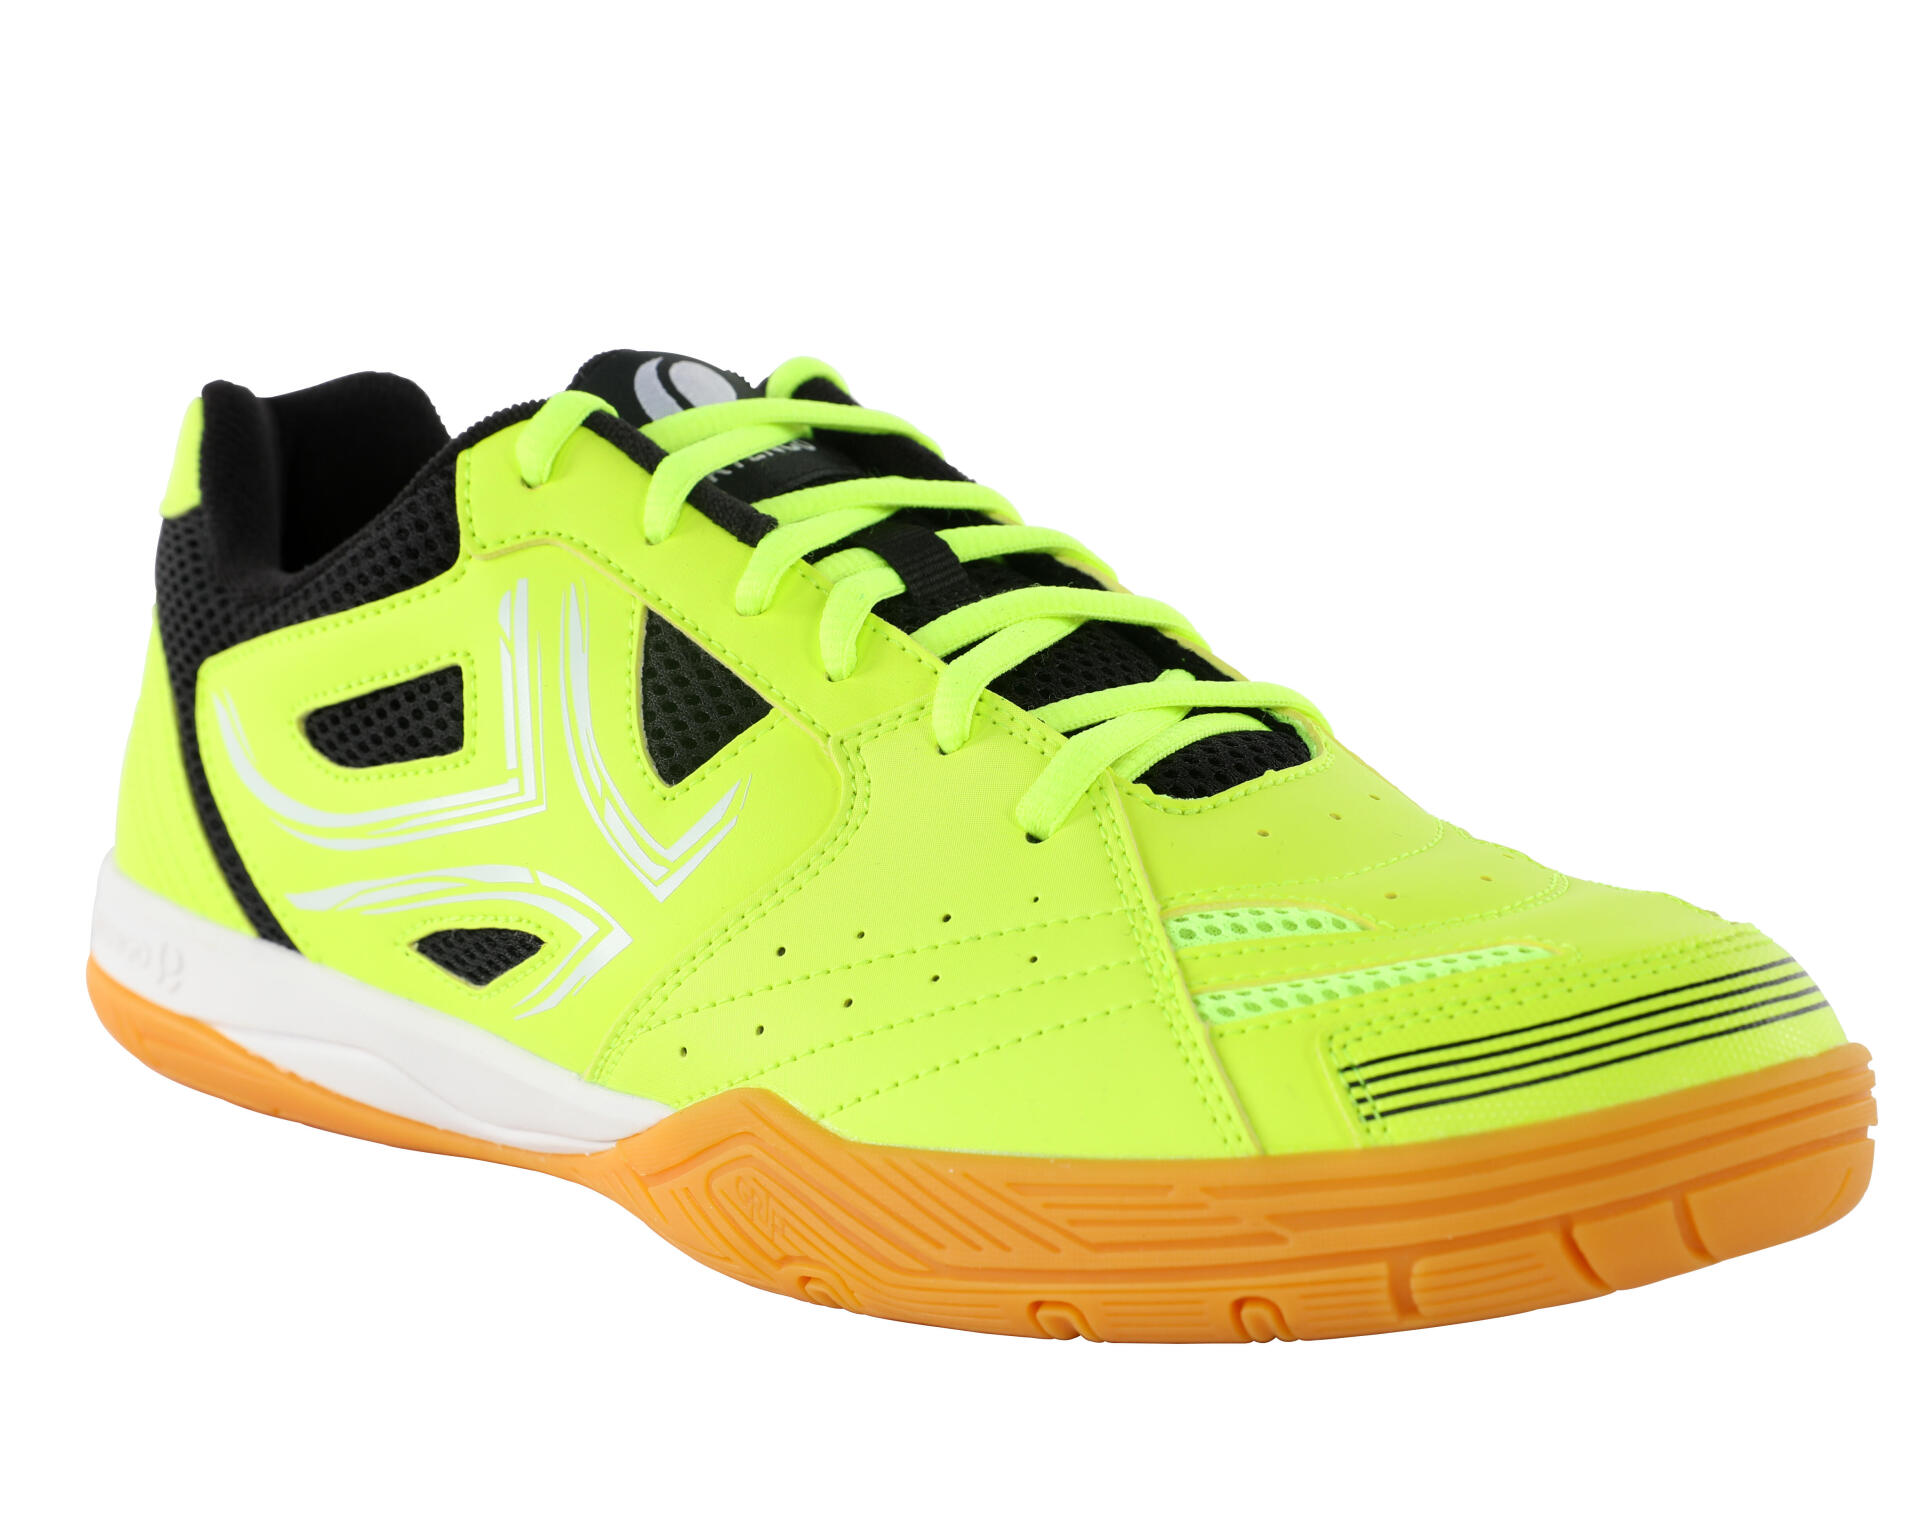 ARTENGO Chaussures TTS 500 Jaune